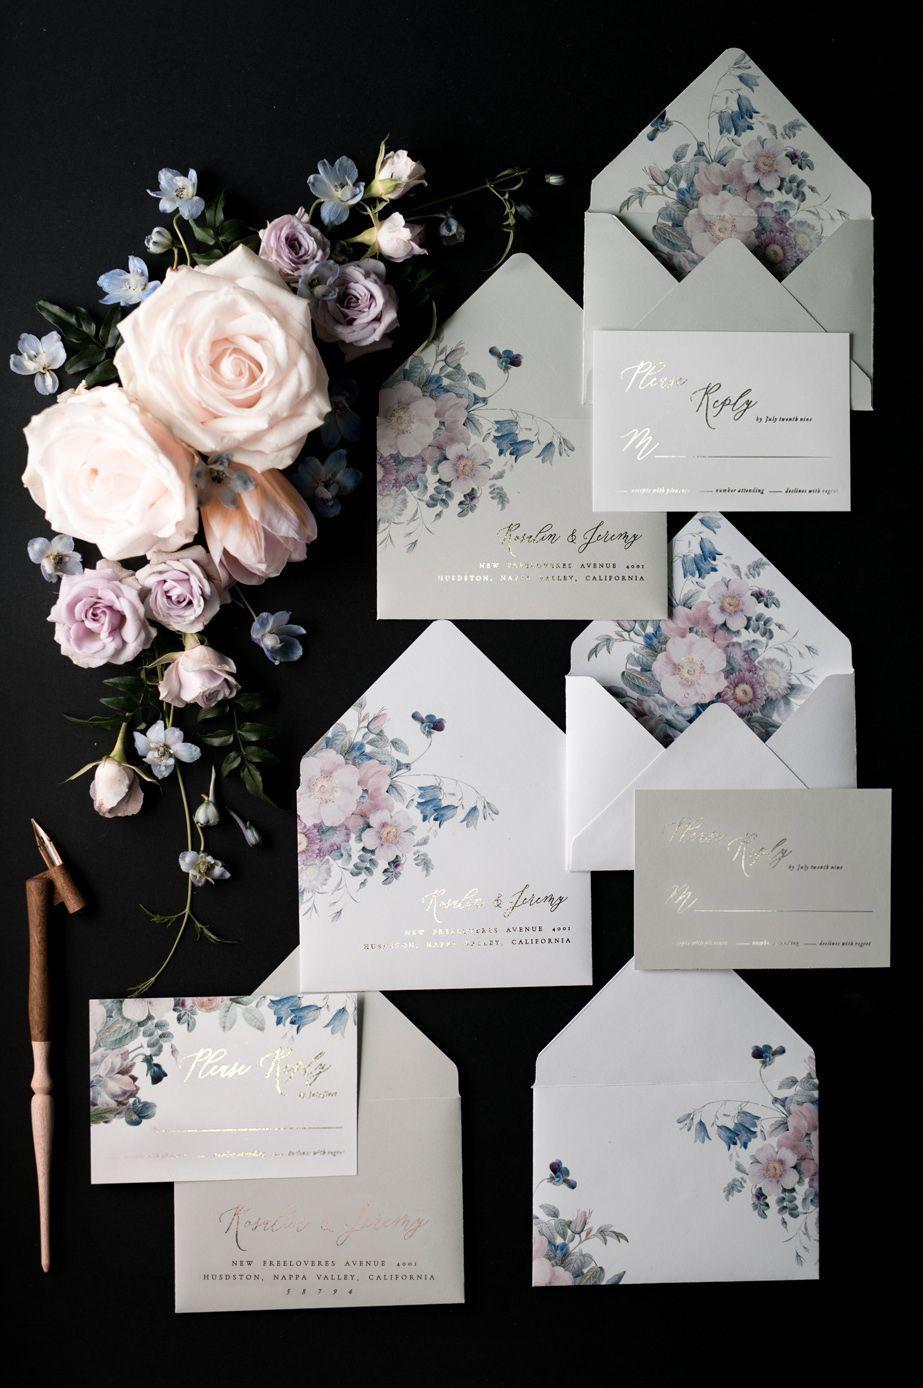 WEDDING INVITATIONS 11NOKalz howtowordweddinginvitationsstyle weddinginvitation WEDDING